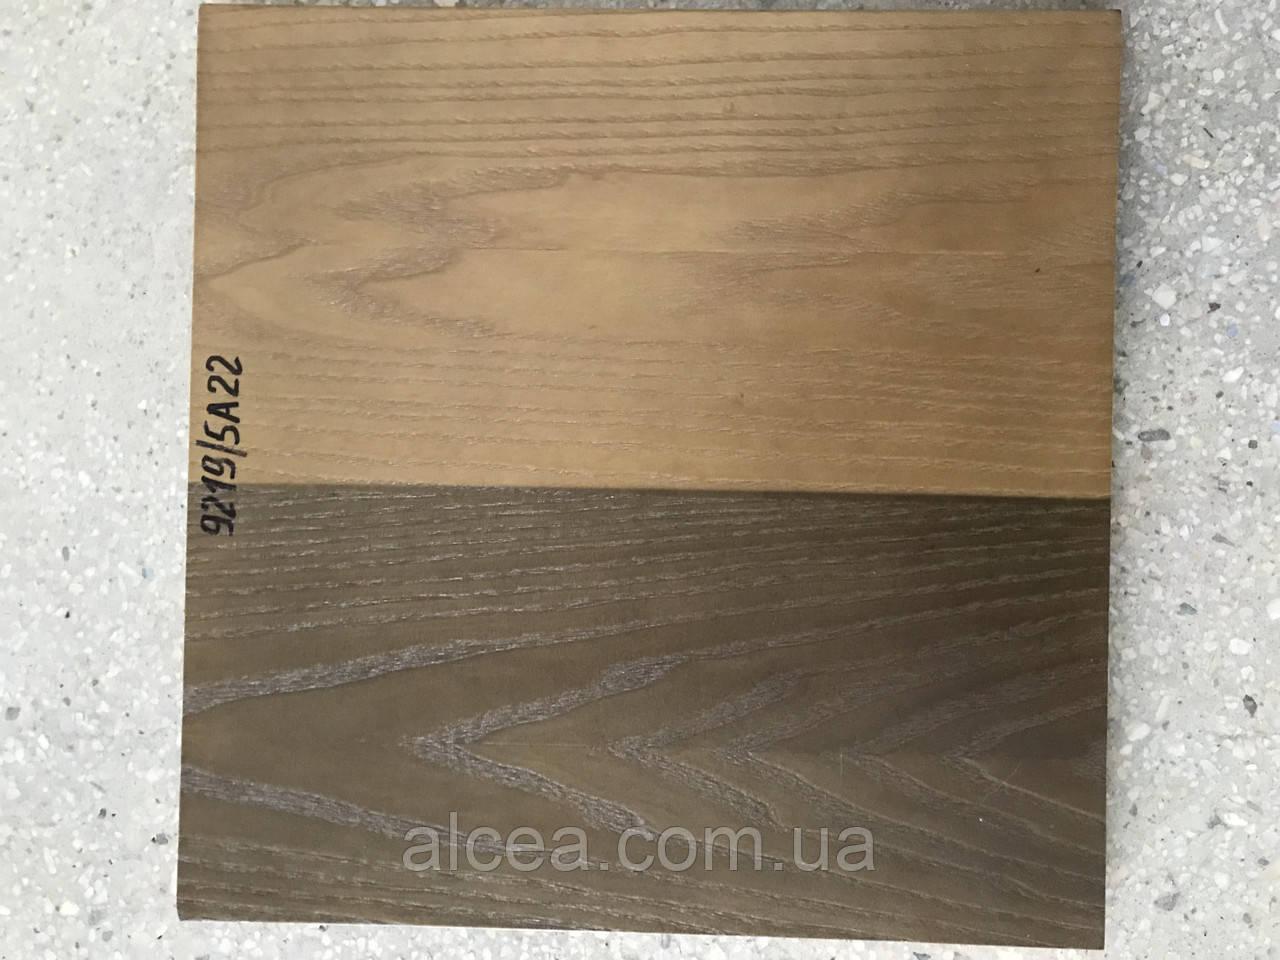 Барвник для деревини концентрат